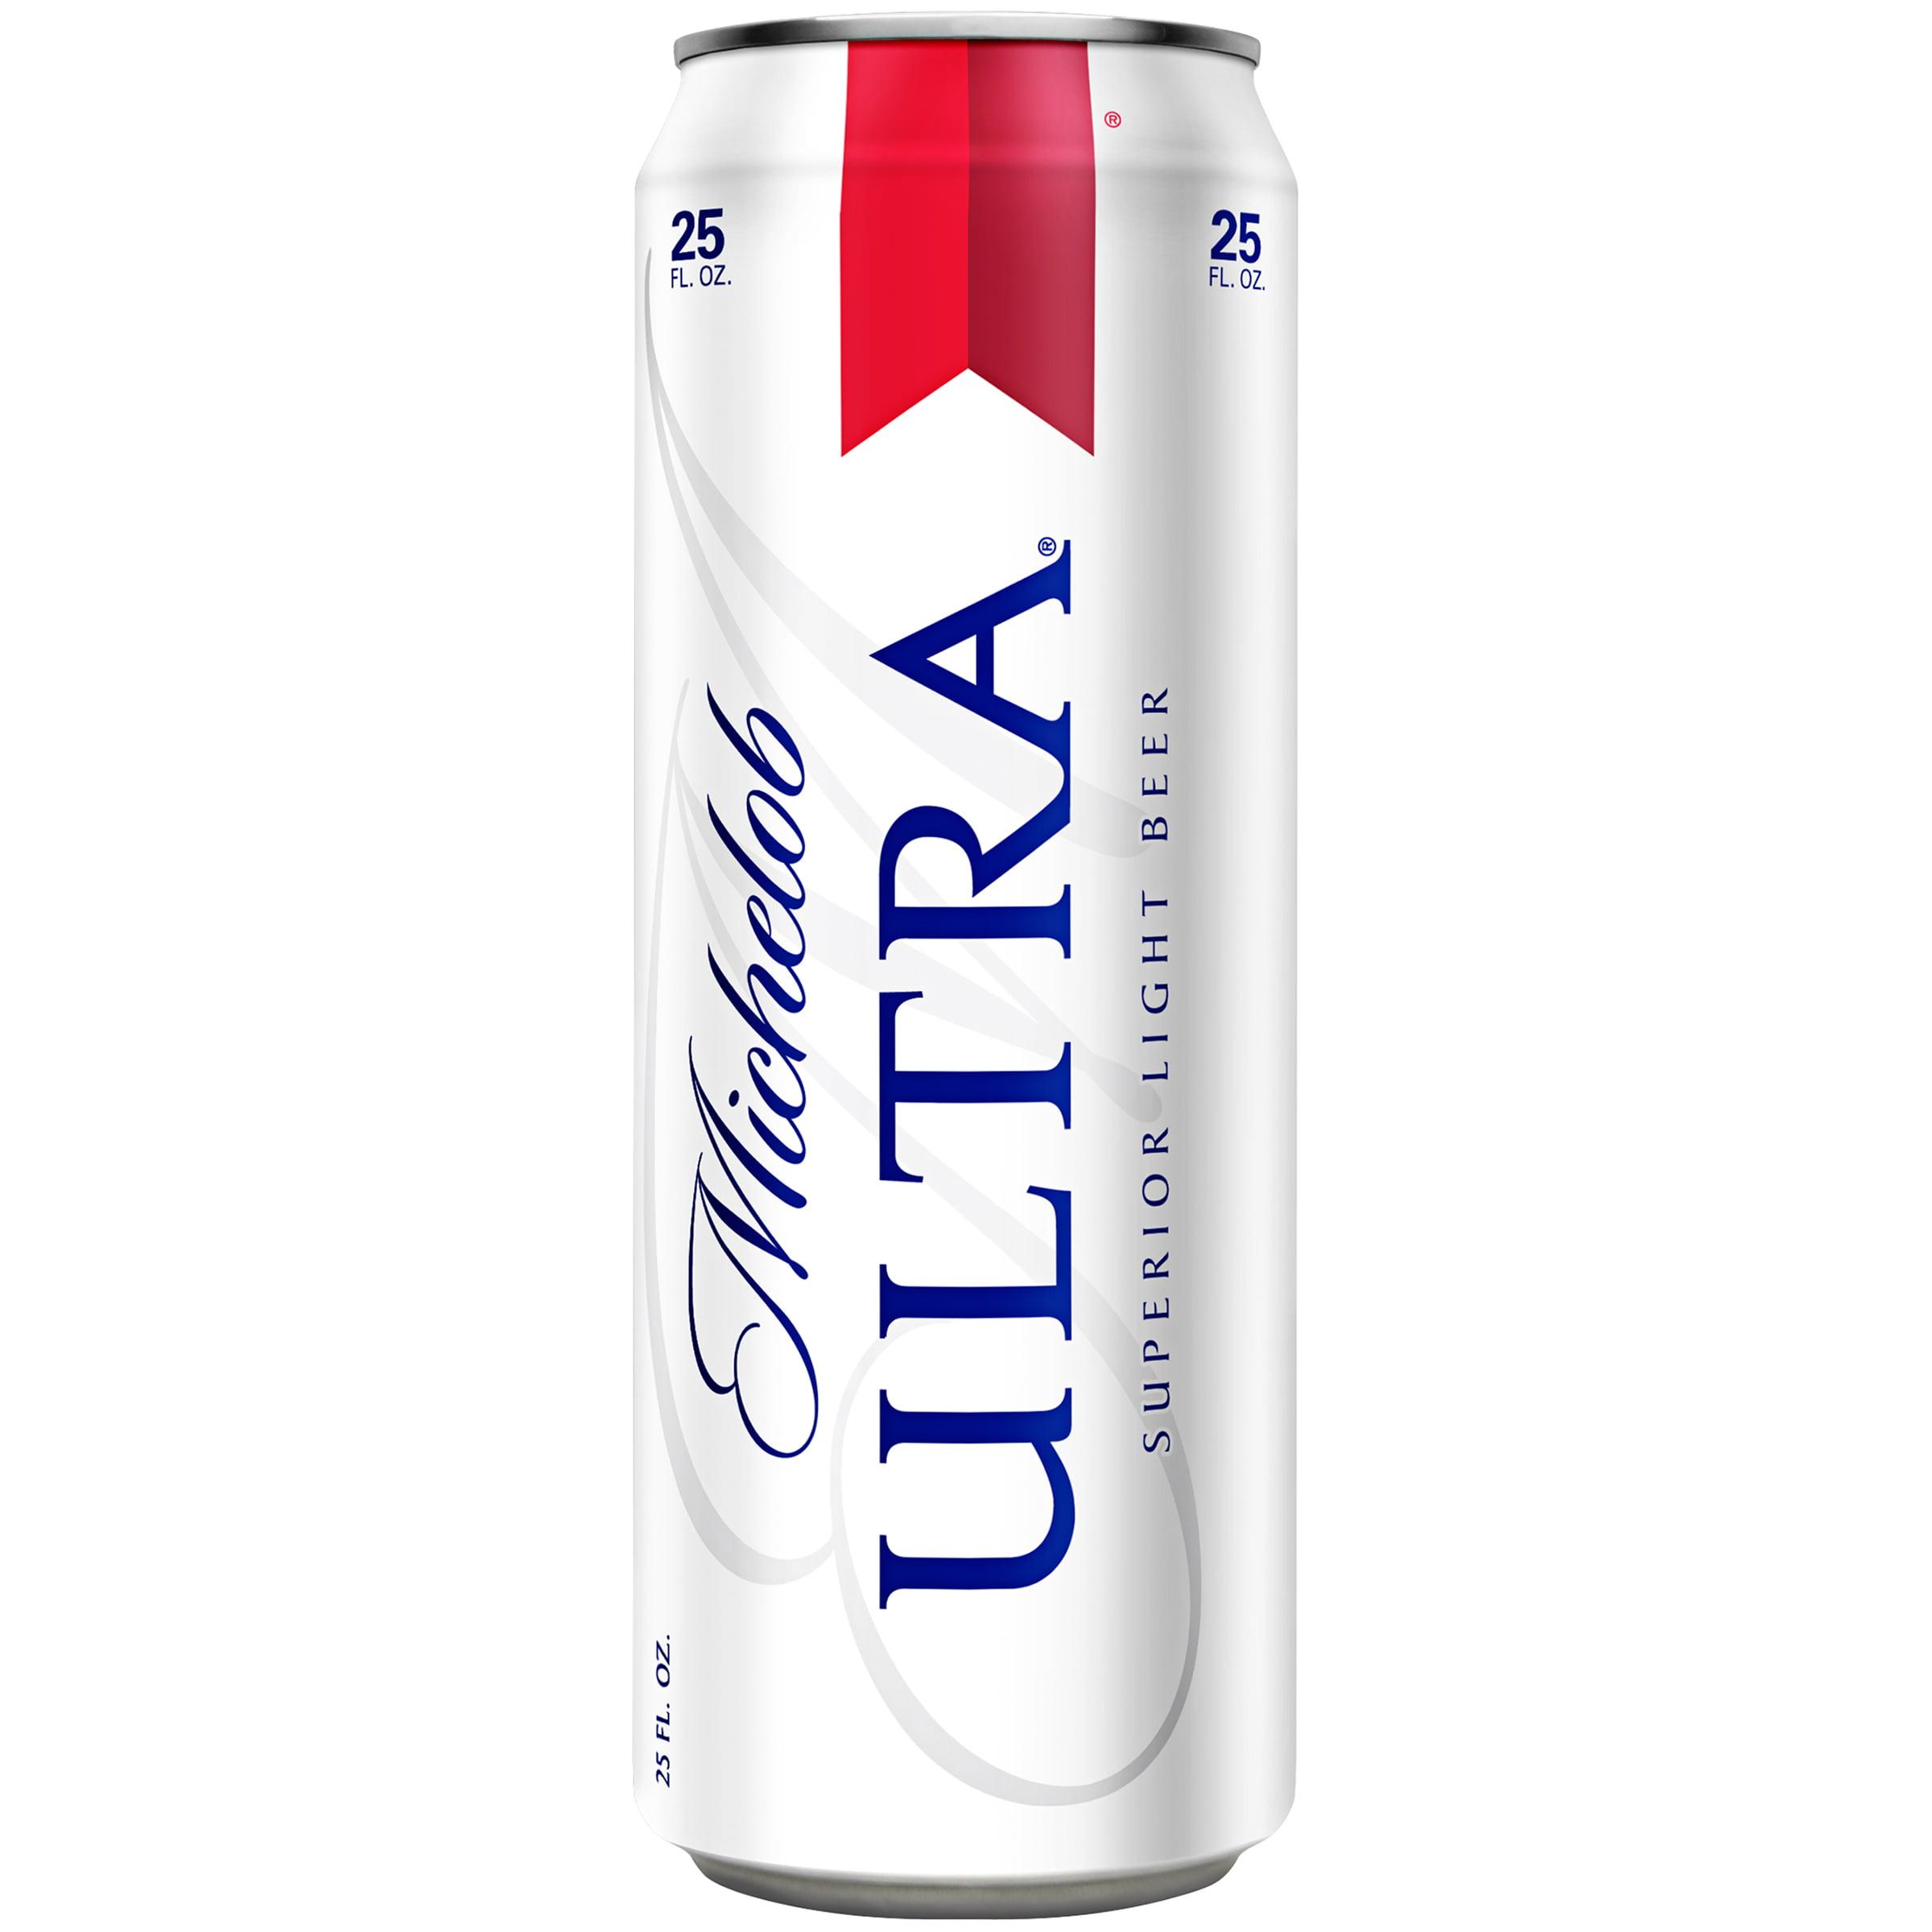 Michelob Ultra Beer, 25 Fl. Oz. Can   Walmart.com